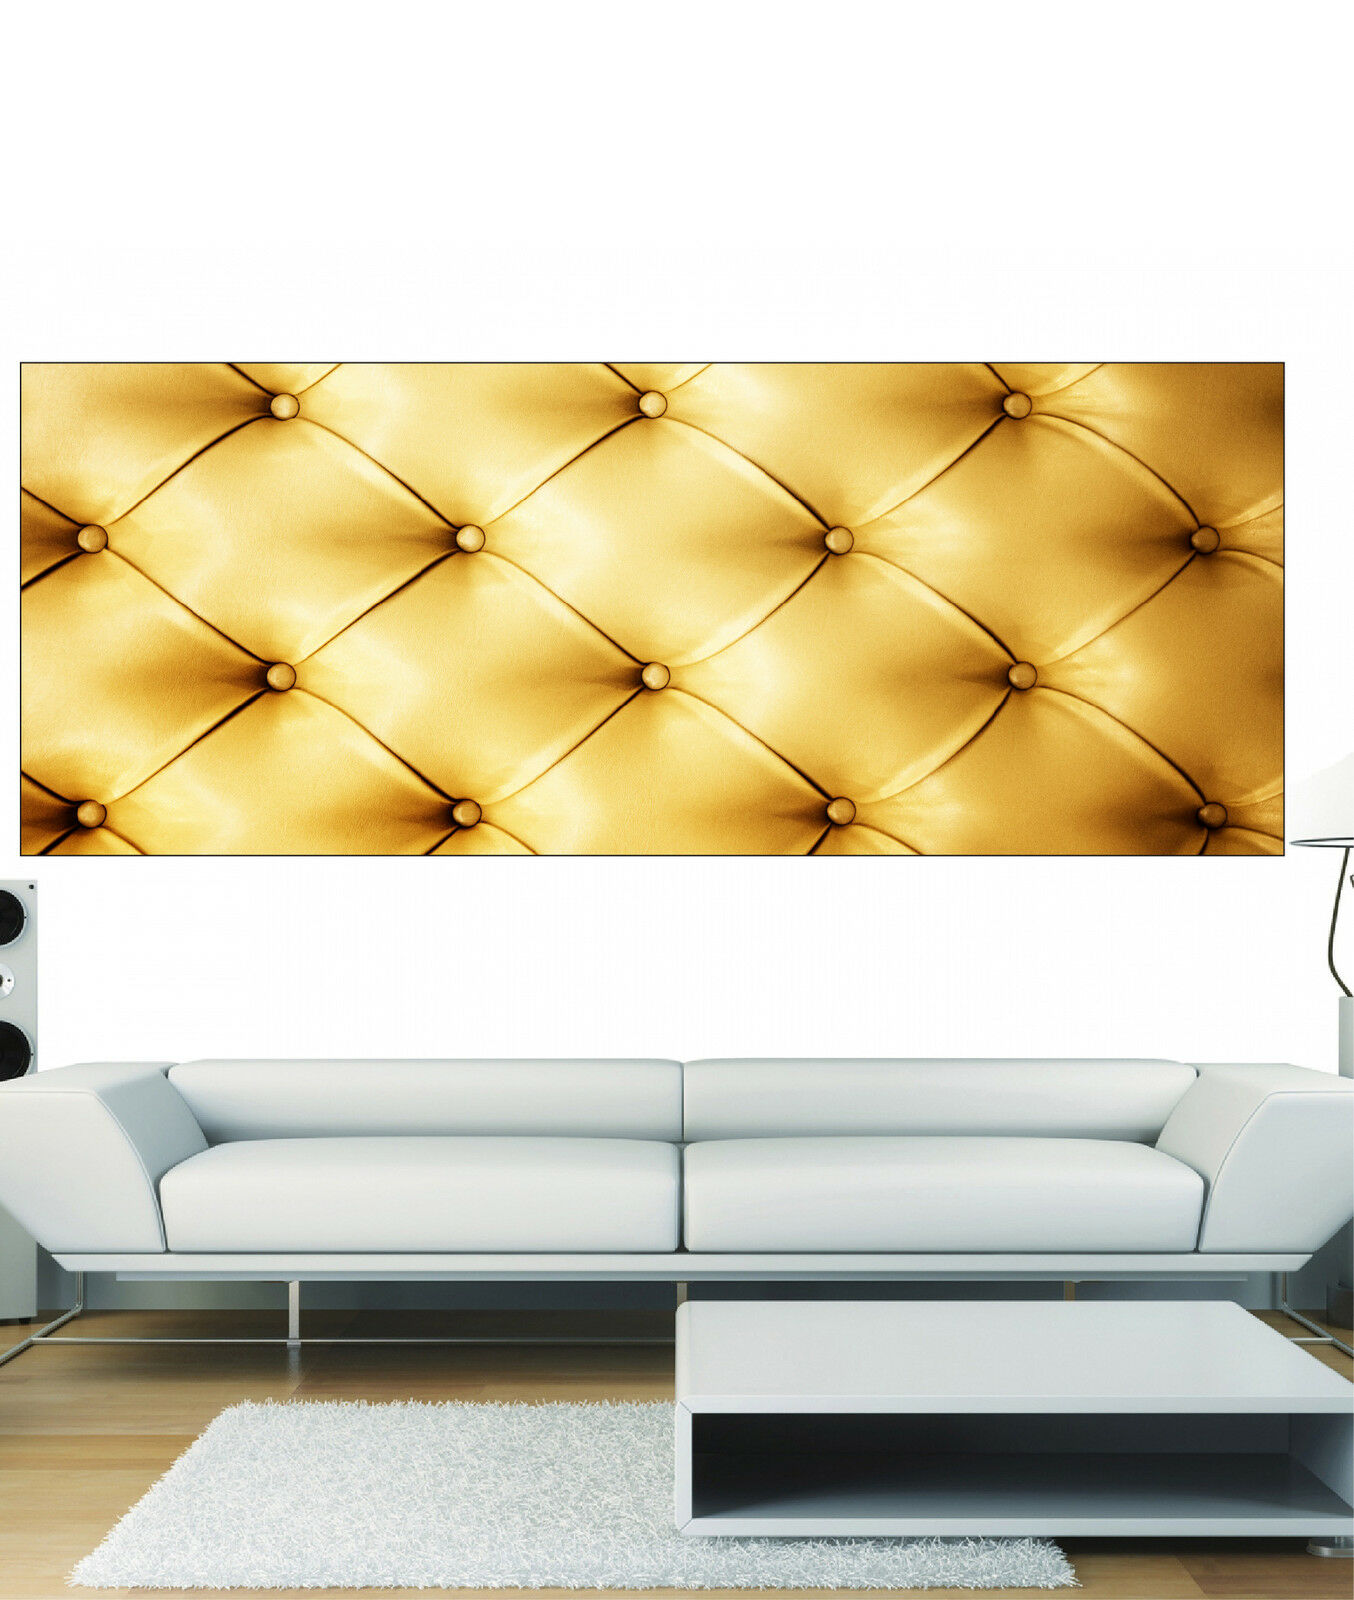 Aufkleber Panorama Deko Wand Gepolstert Gold Ref 3620 (13 Größe)